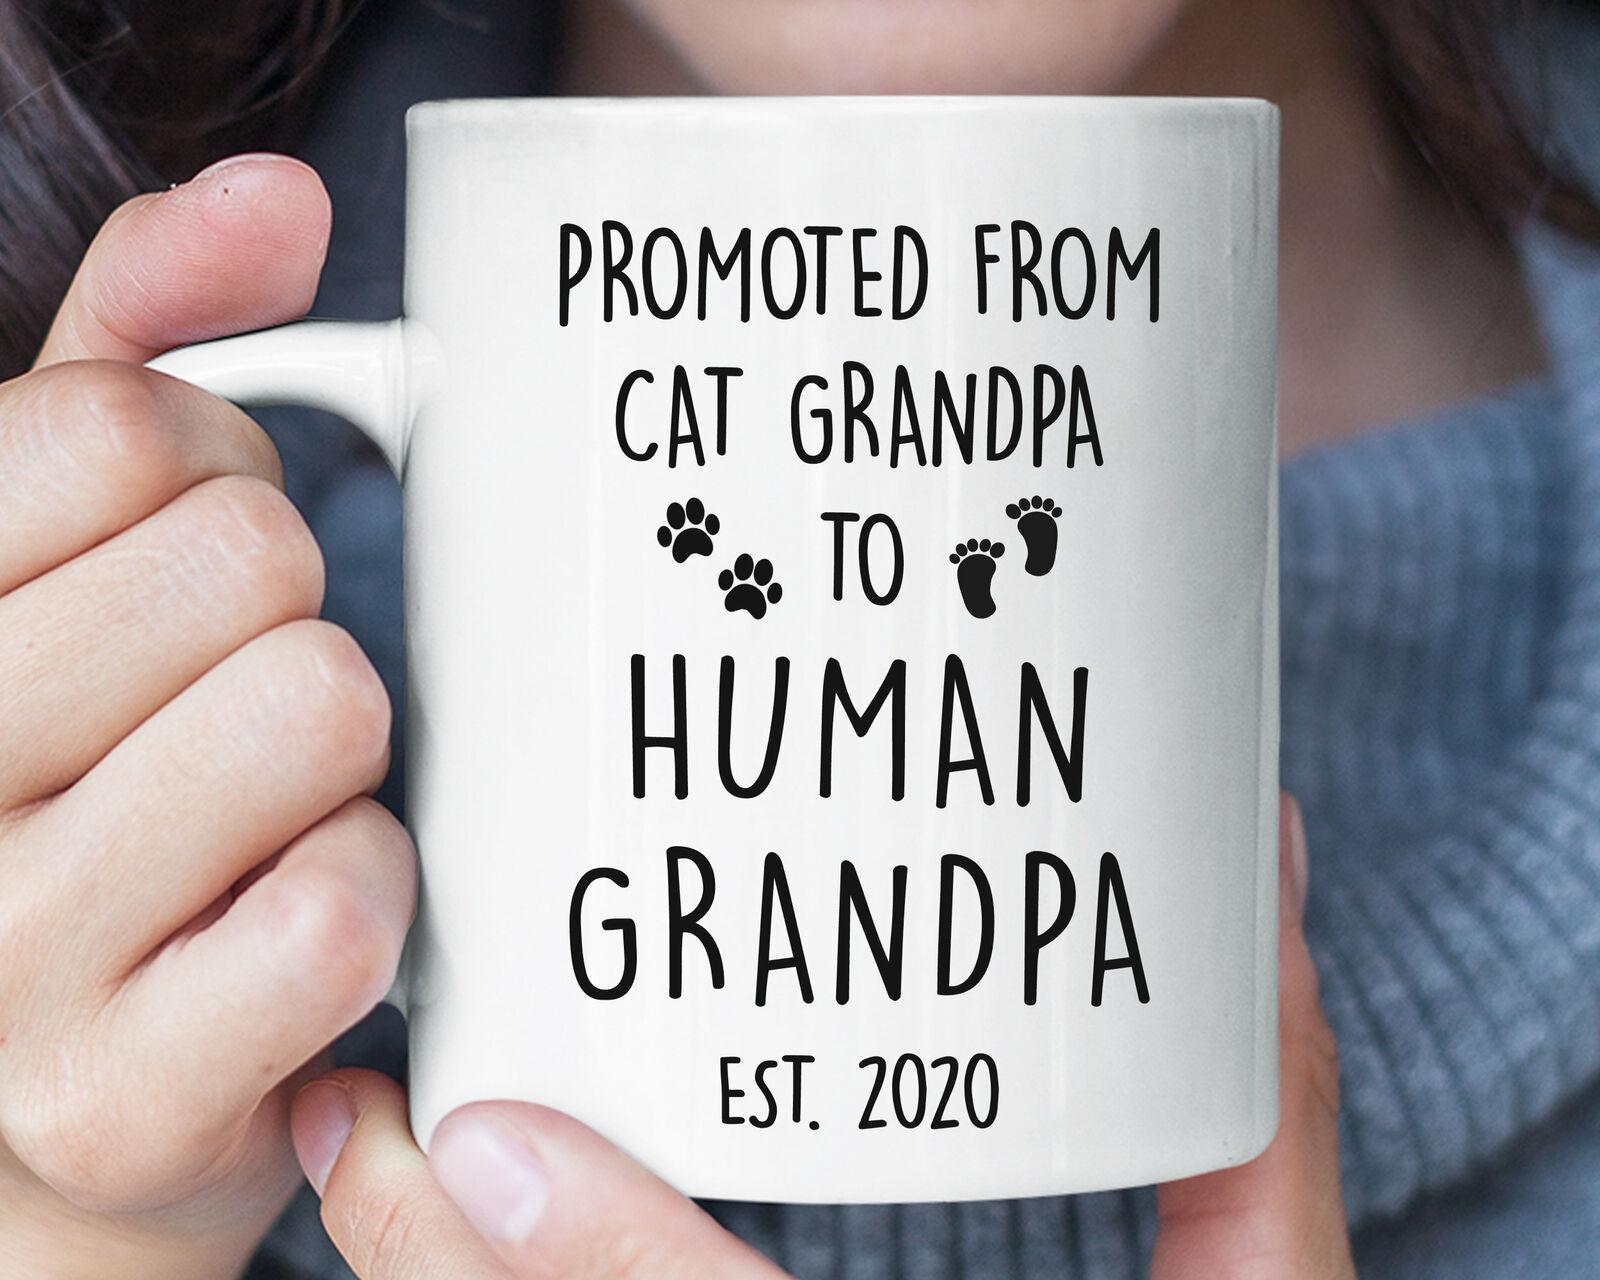 Promoted From Cat Grandpa To Human Grandpa Funny Mug Grandparent Pregnancy - $13.99